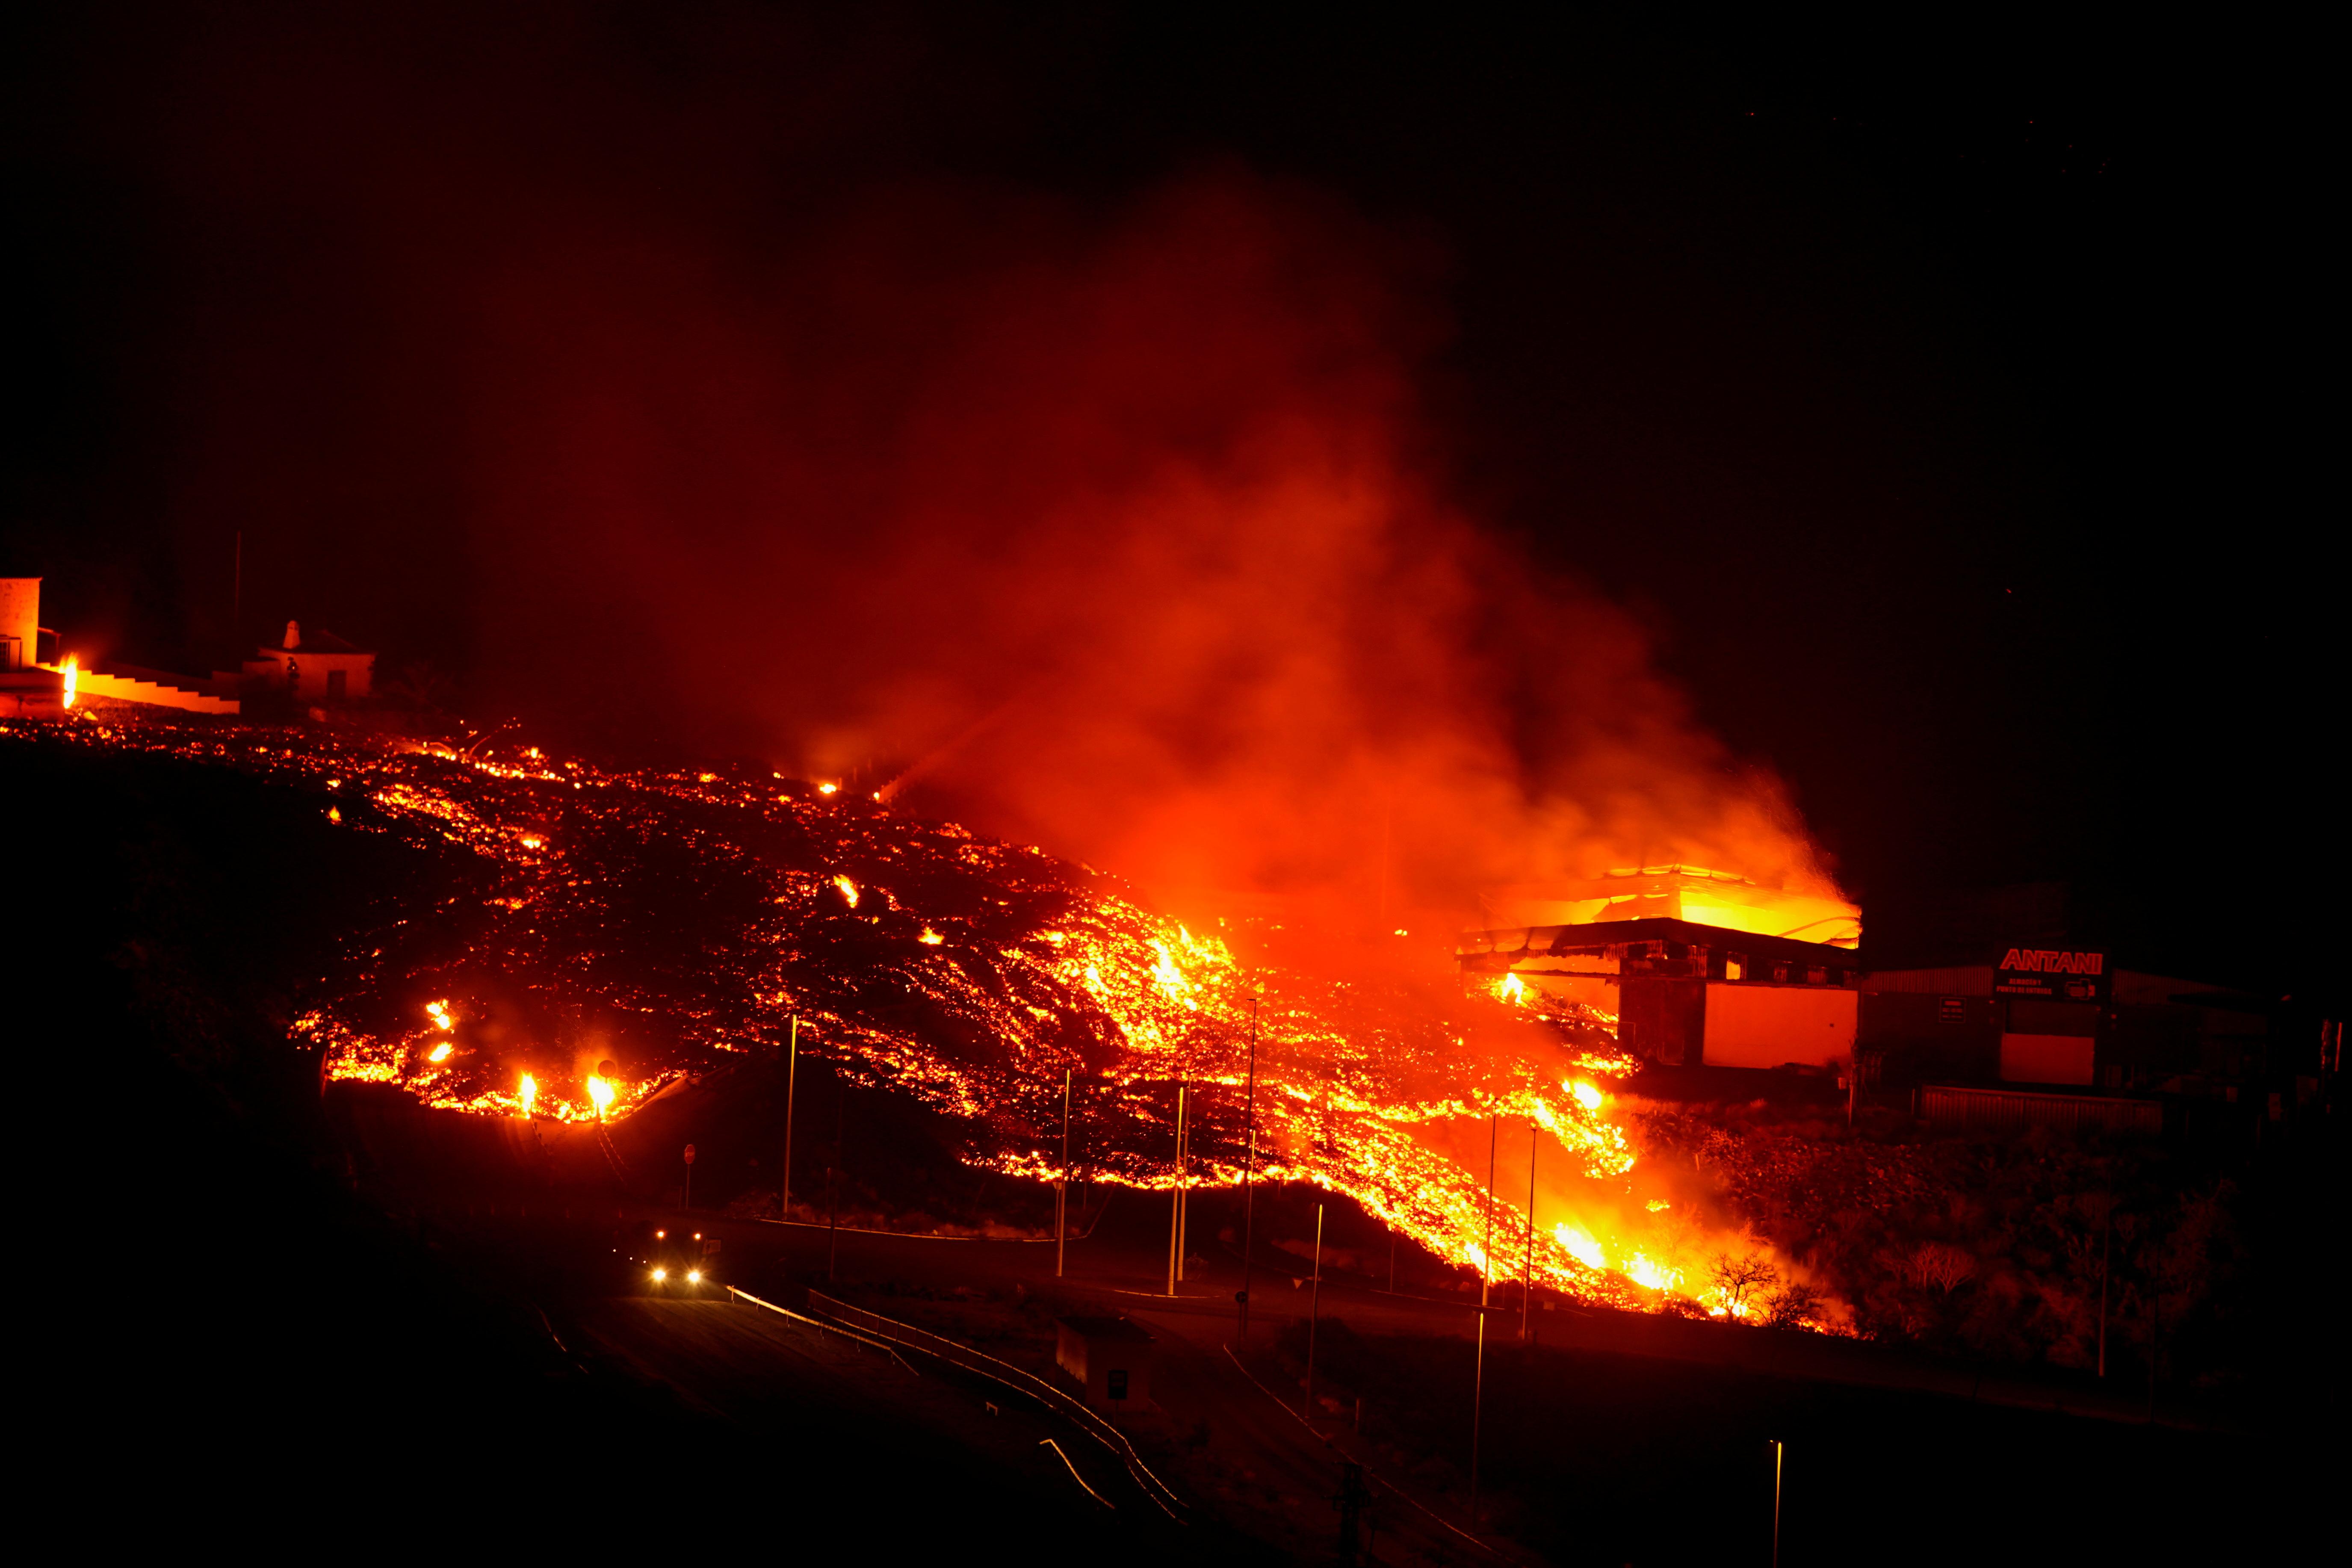 Lava burns buildings following the eruption of the Cumbre Vieja volcano, in Tacande, Spain, October 9, 2021. REUTERS/Juan Medina